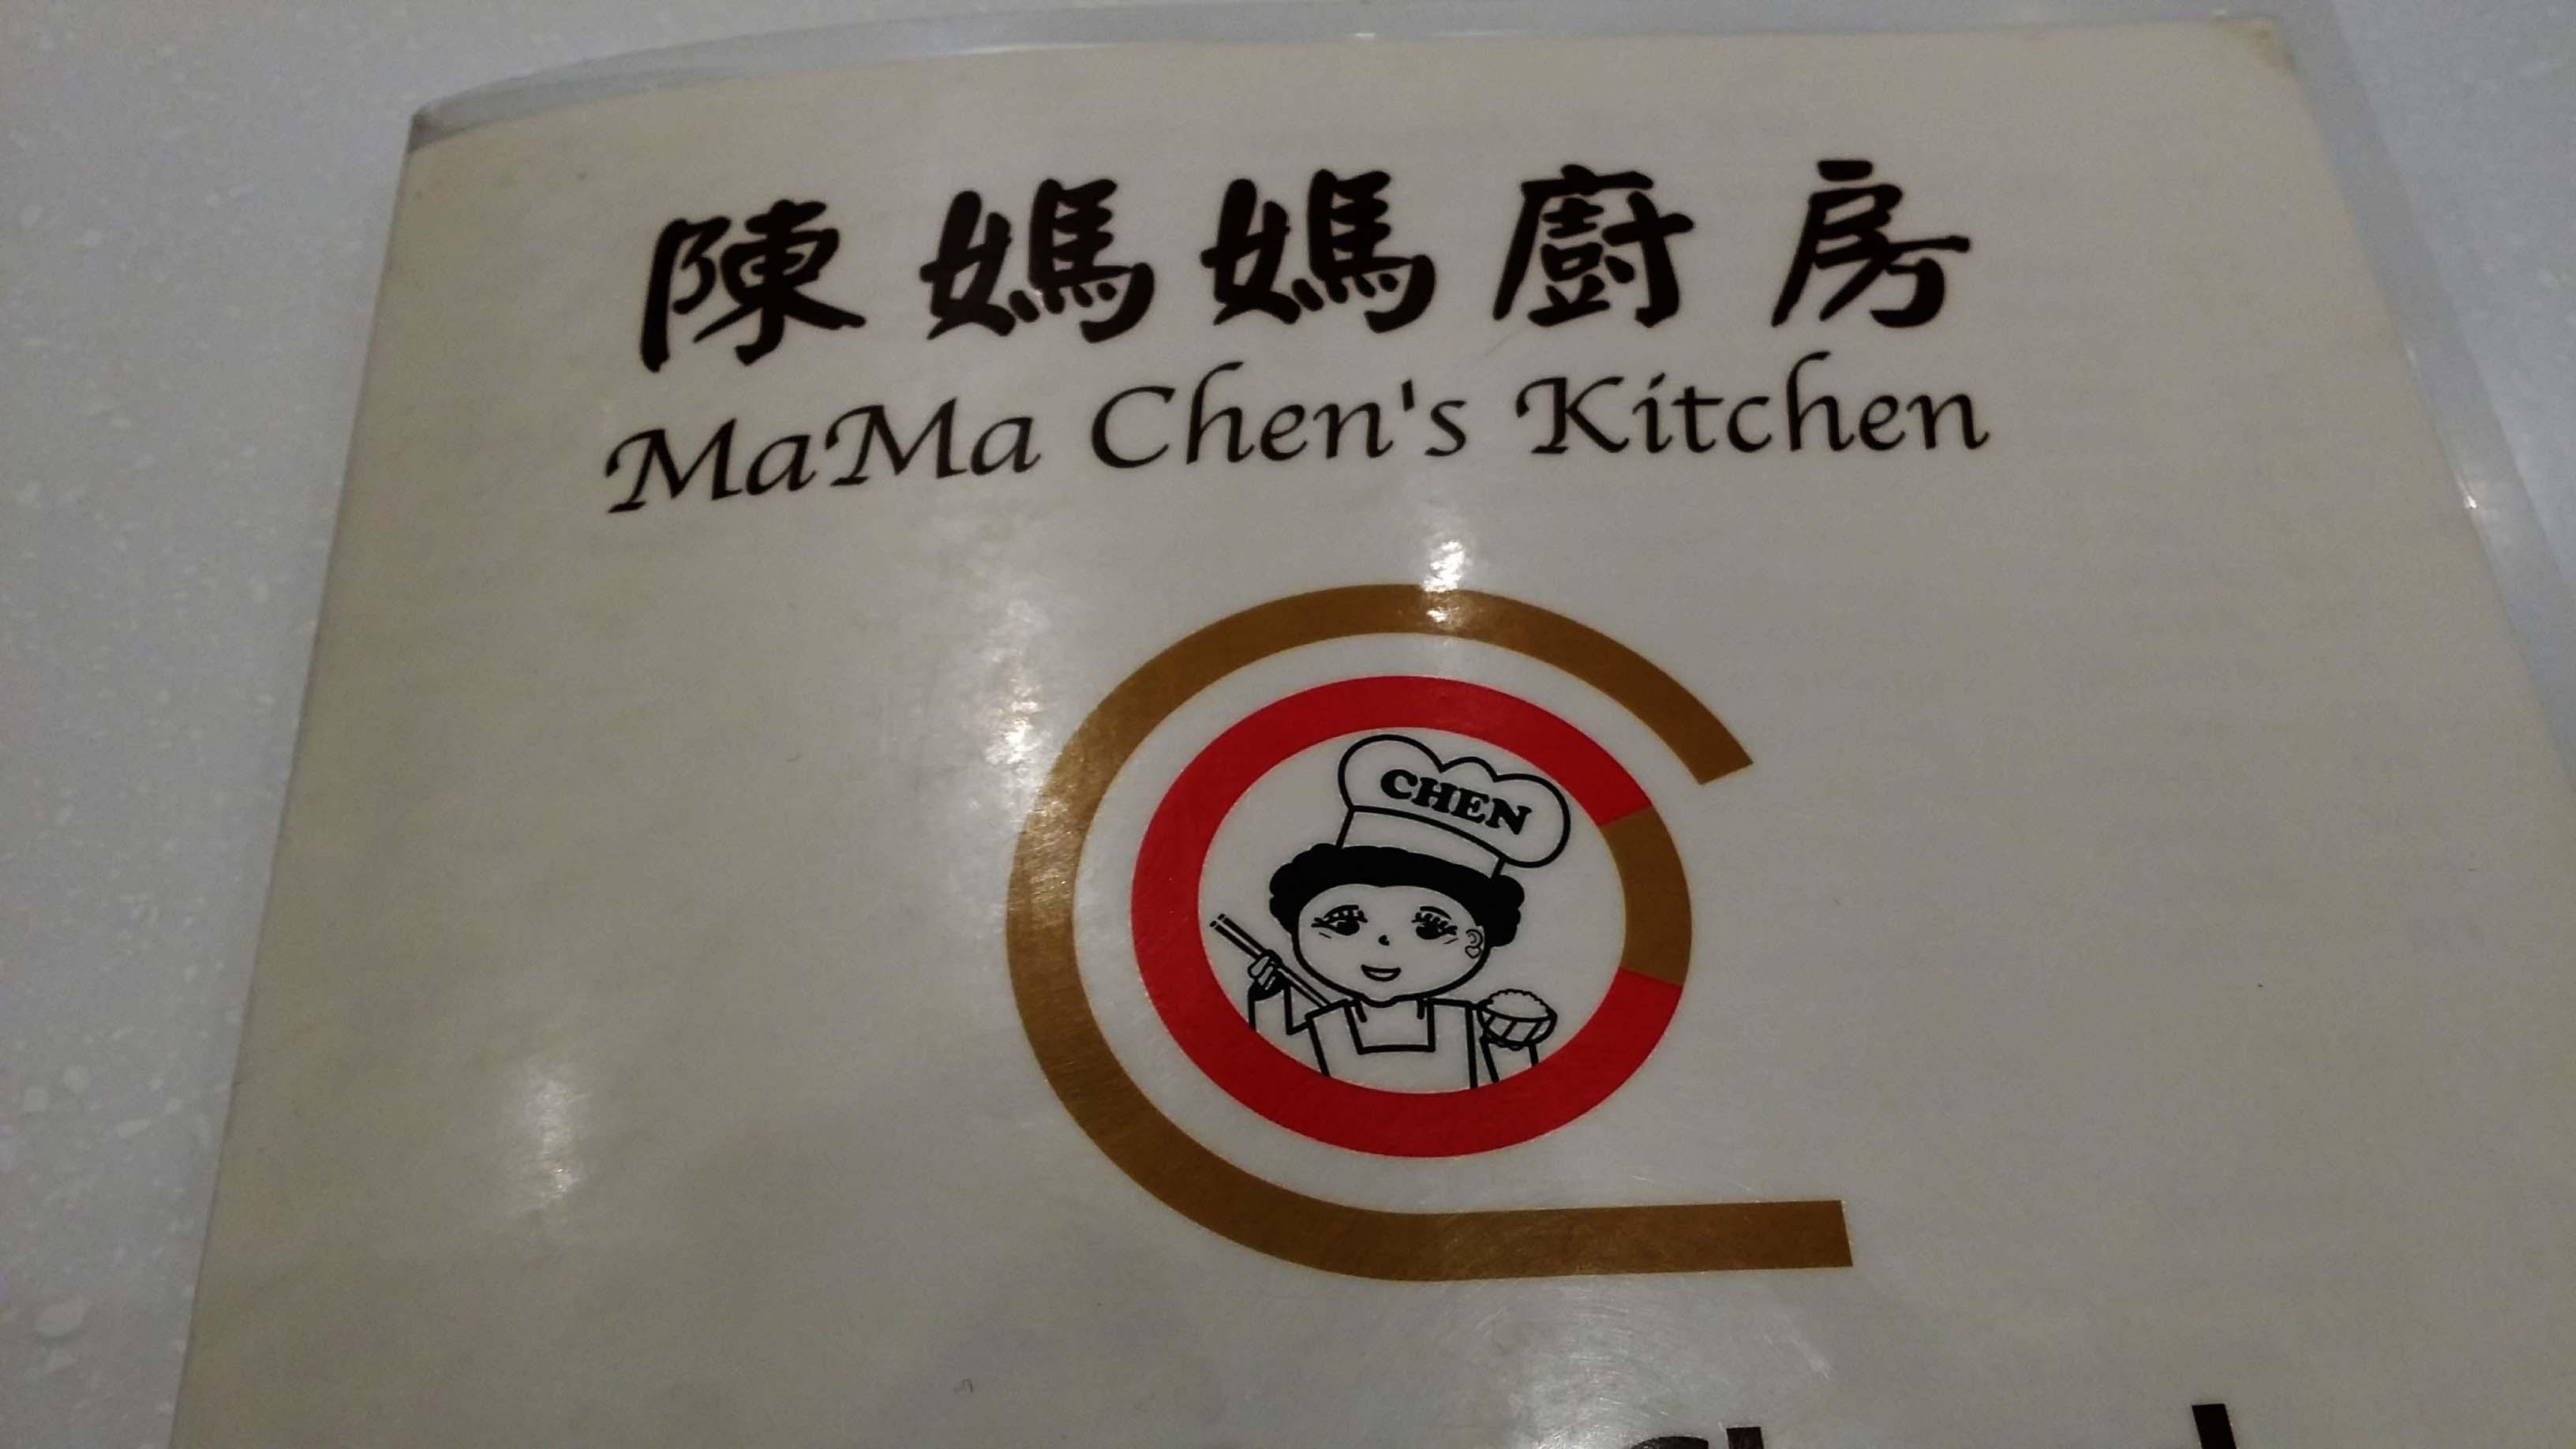 chen s kitchen menu home image ideas